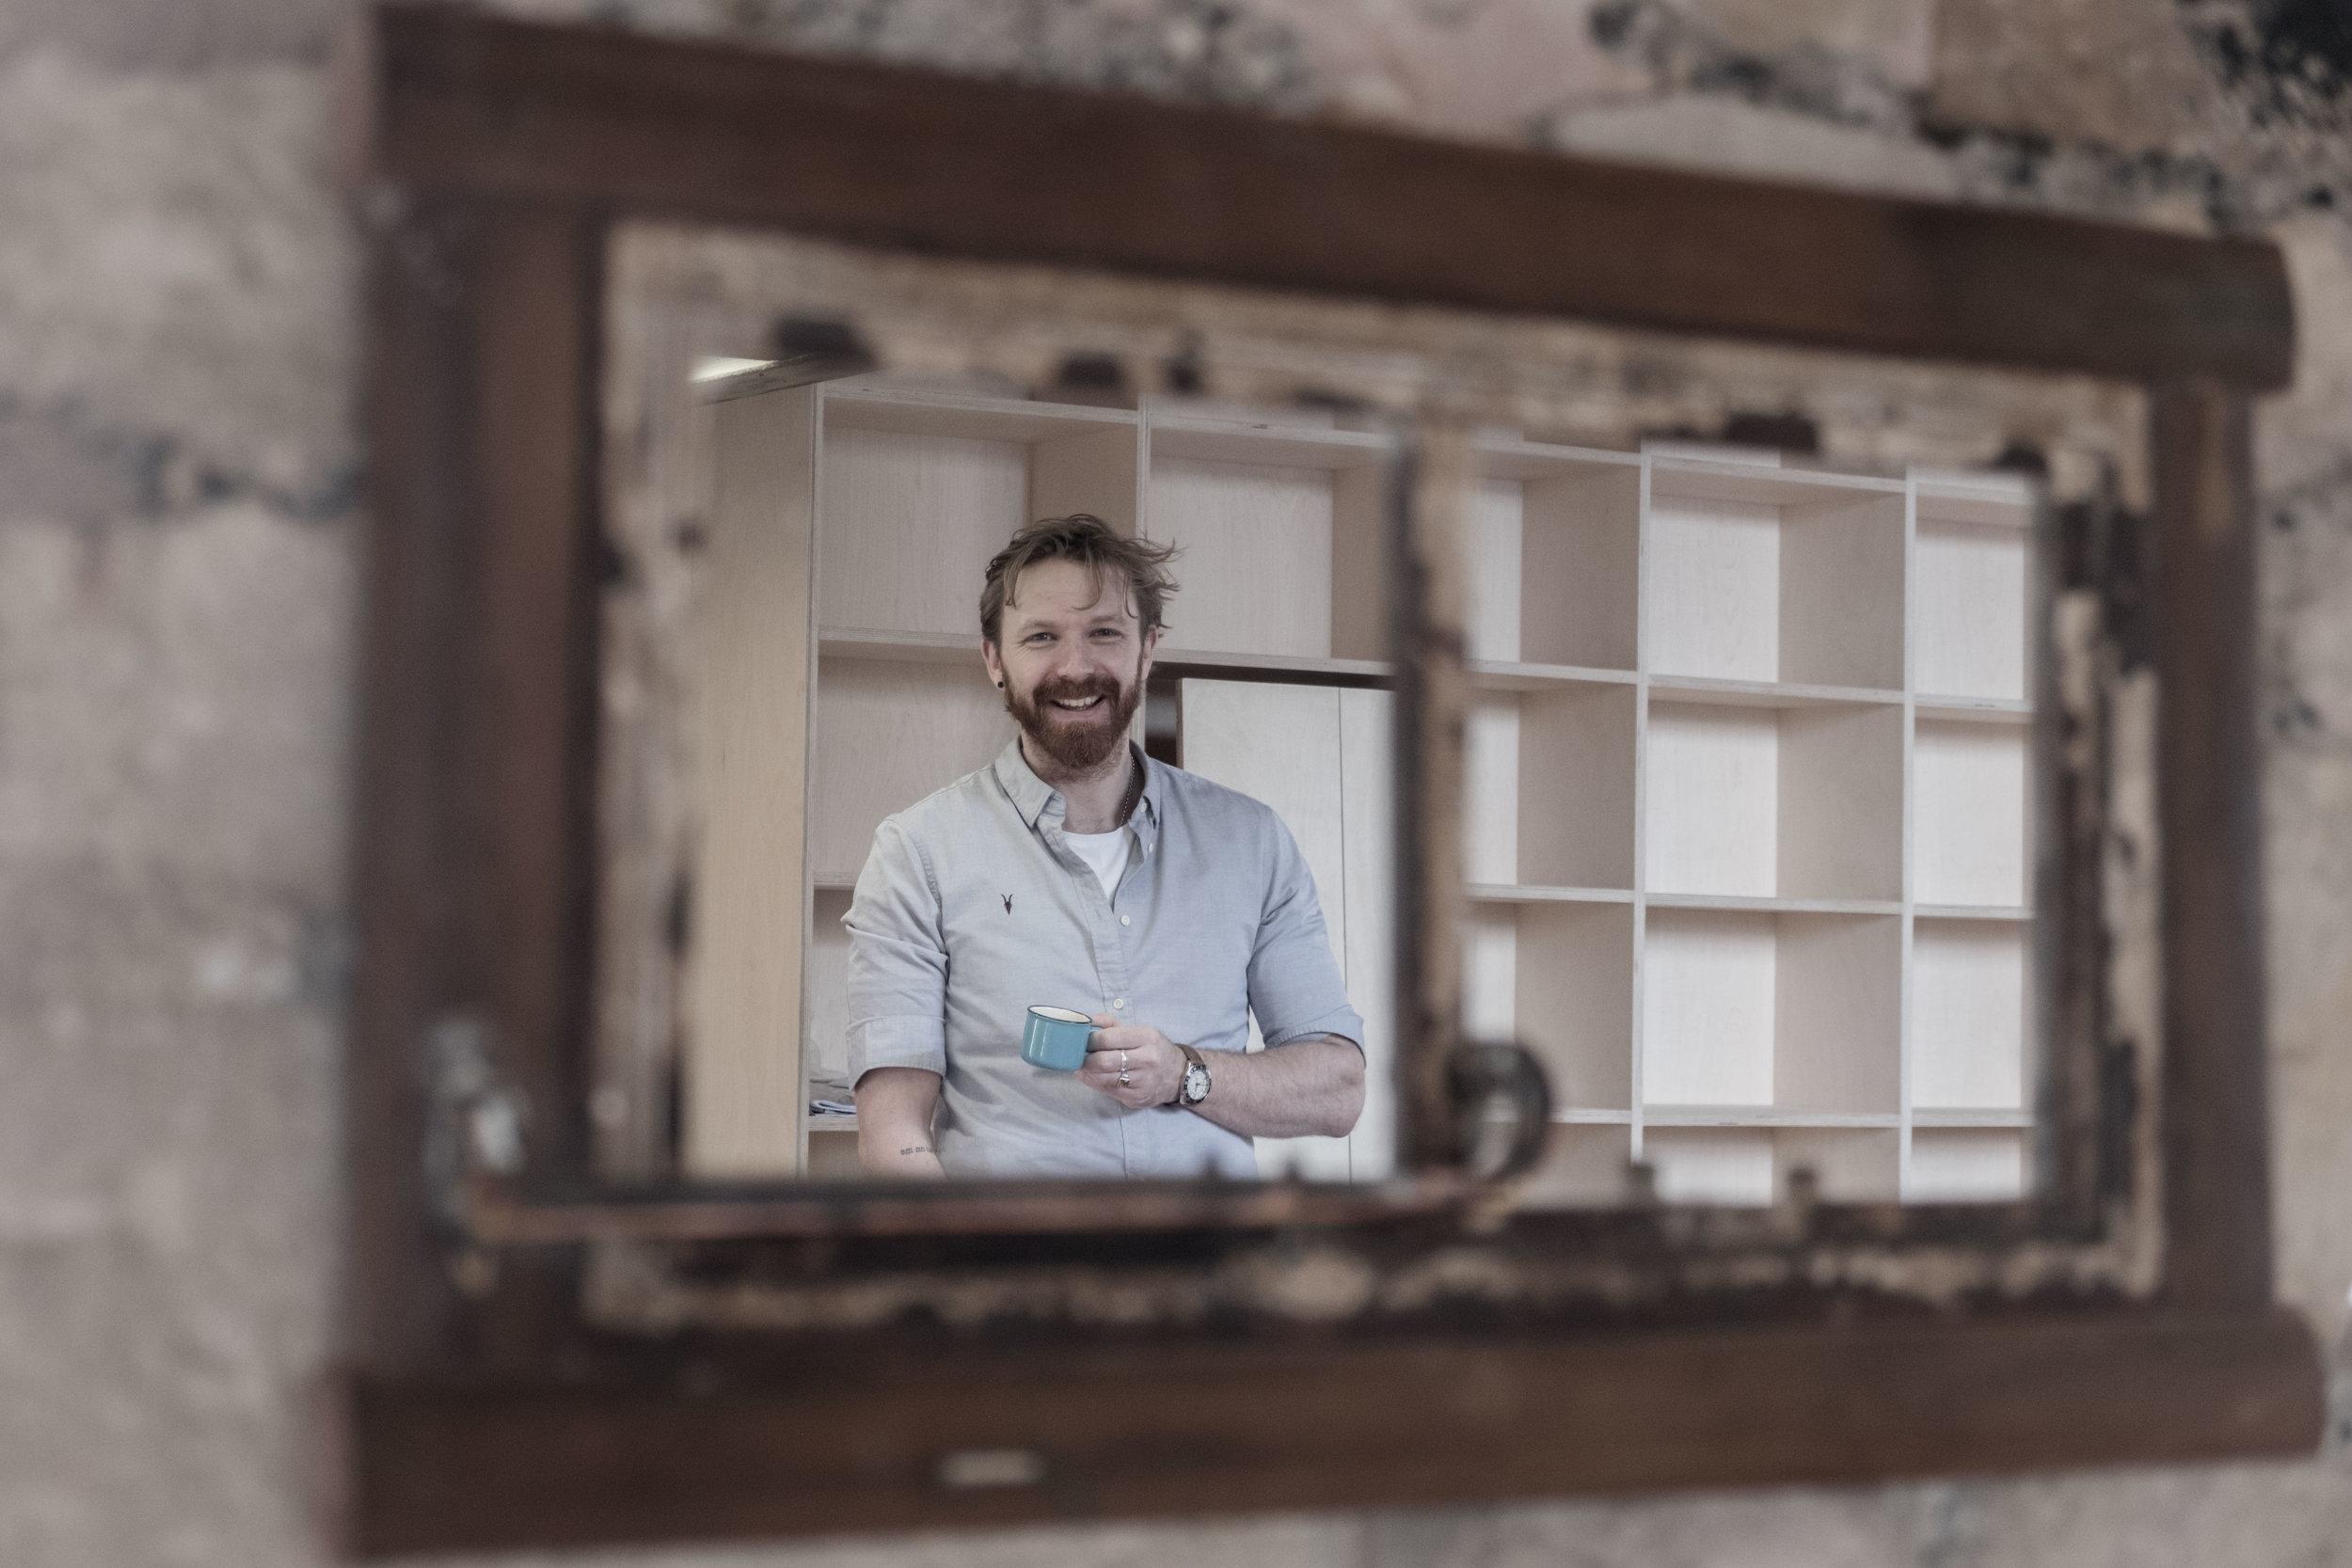 Photo: Me, in a mirror. Photo by Paul osborne